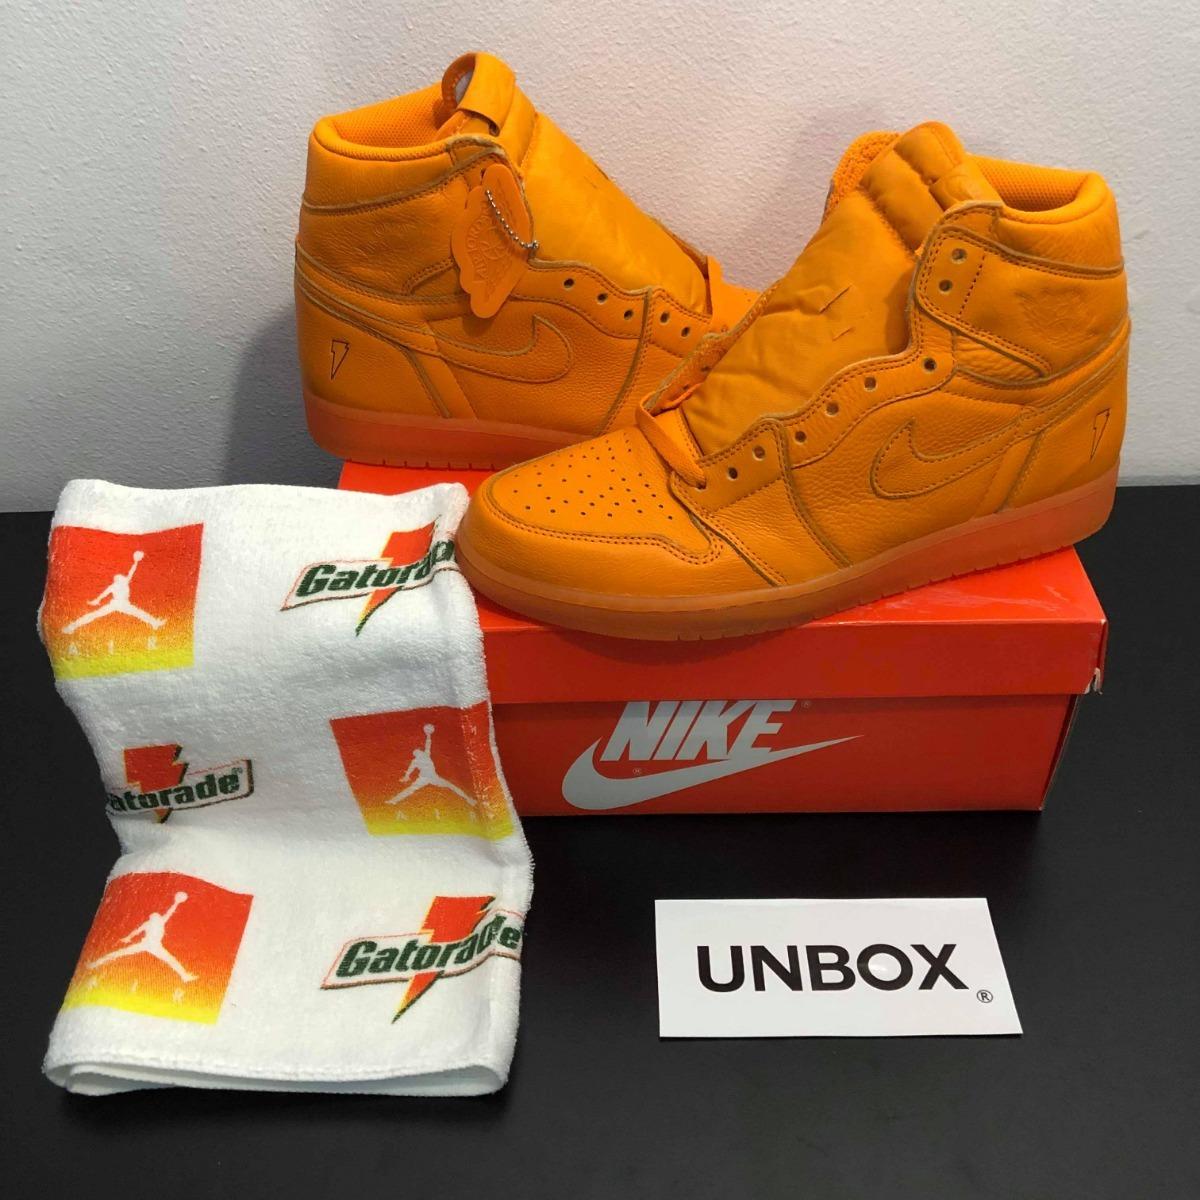 huge selection of e8e54 f4c31 Tenis Nike Air Jordan 1 Retro Og Gatorade - Orange Peel